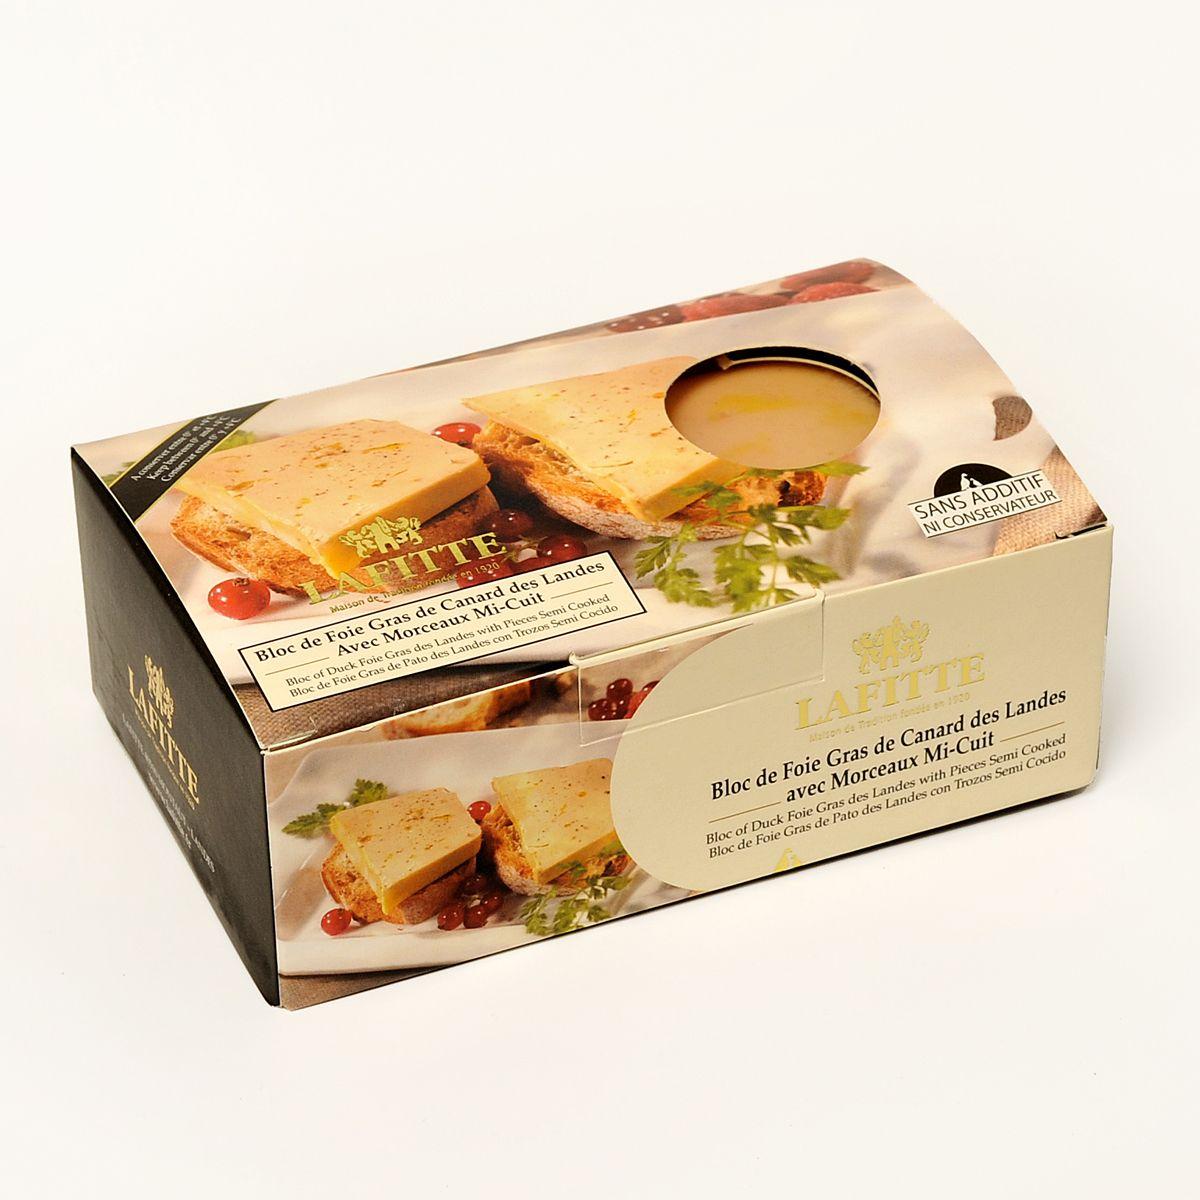 Bloc de foie gras de canard Micuit Lafitte 180 grs